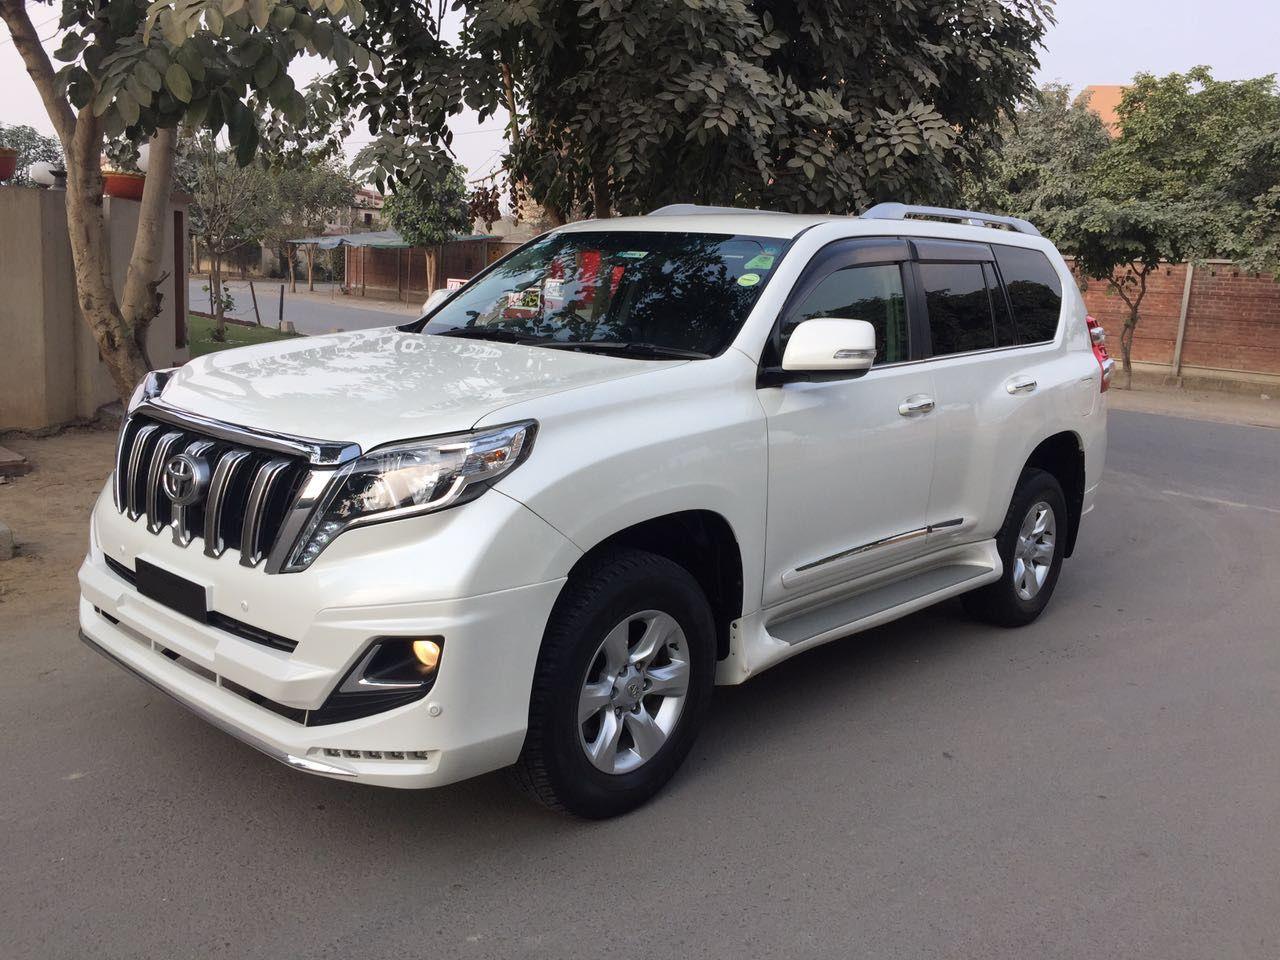 RCI Motors Islamabad Rent a Car Service Motores, Lujos